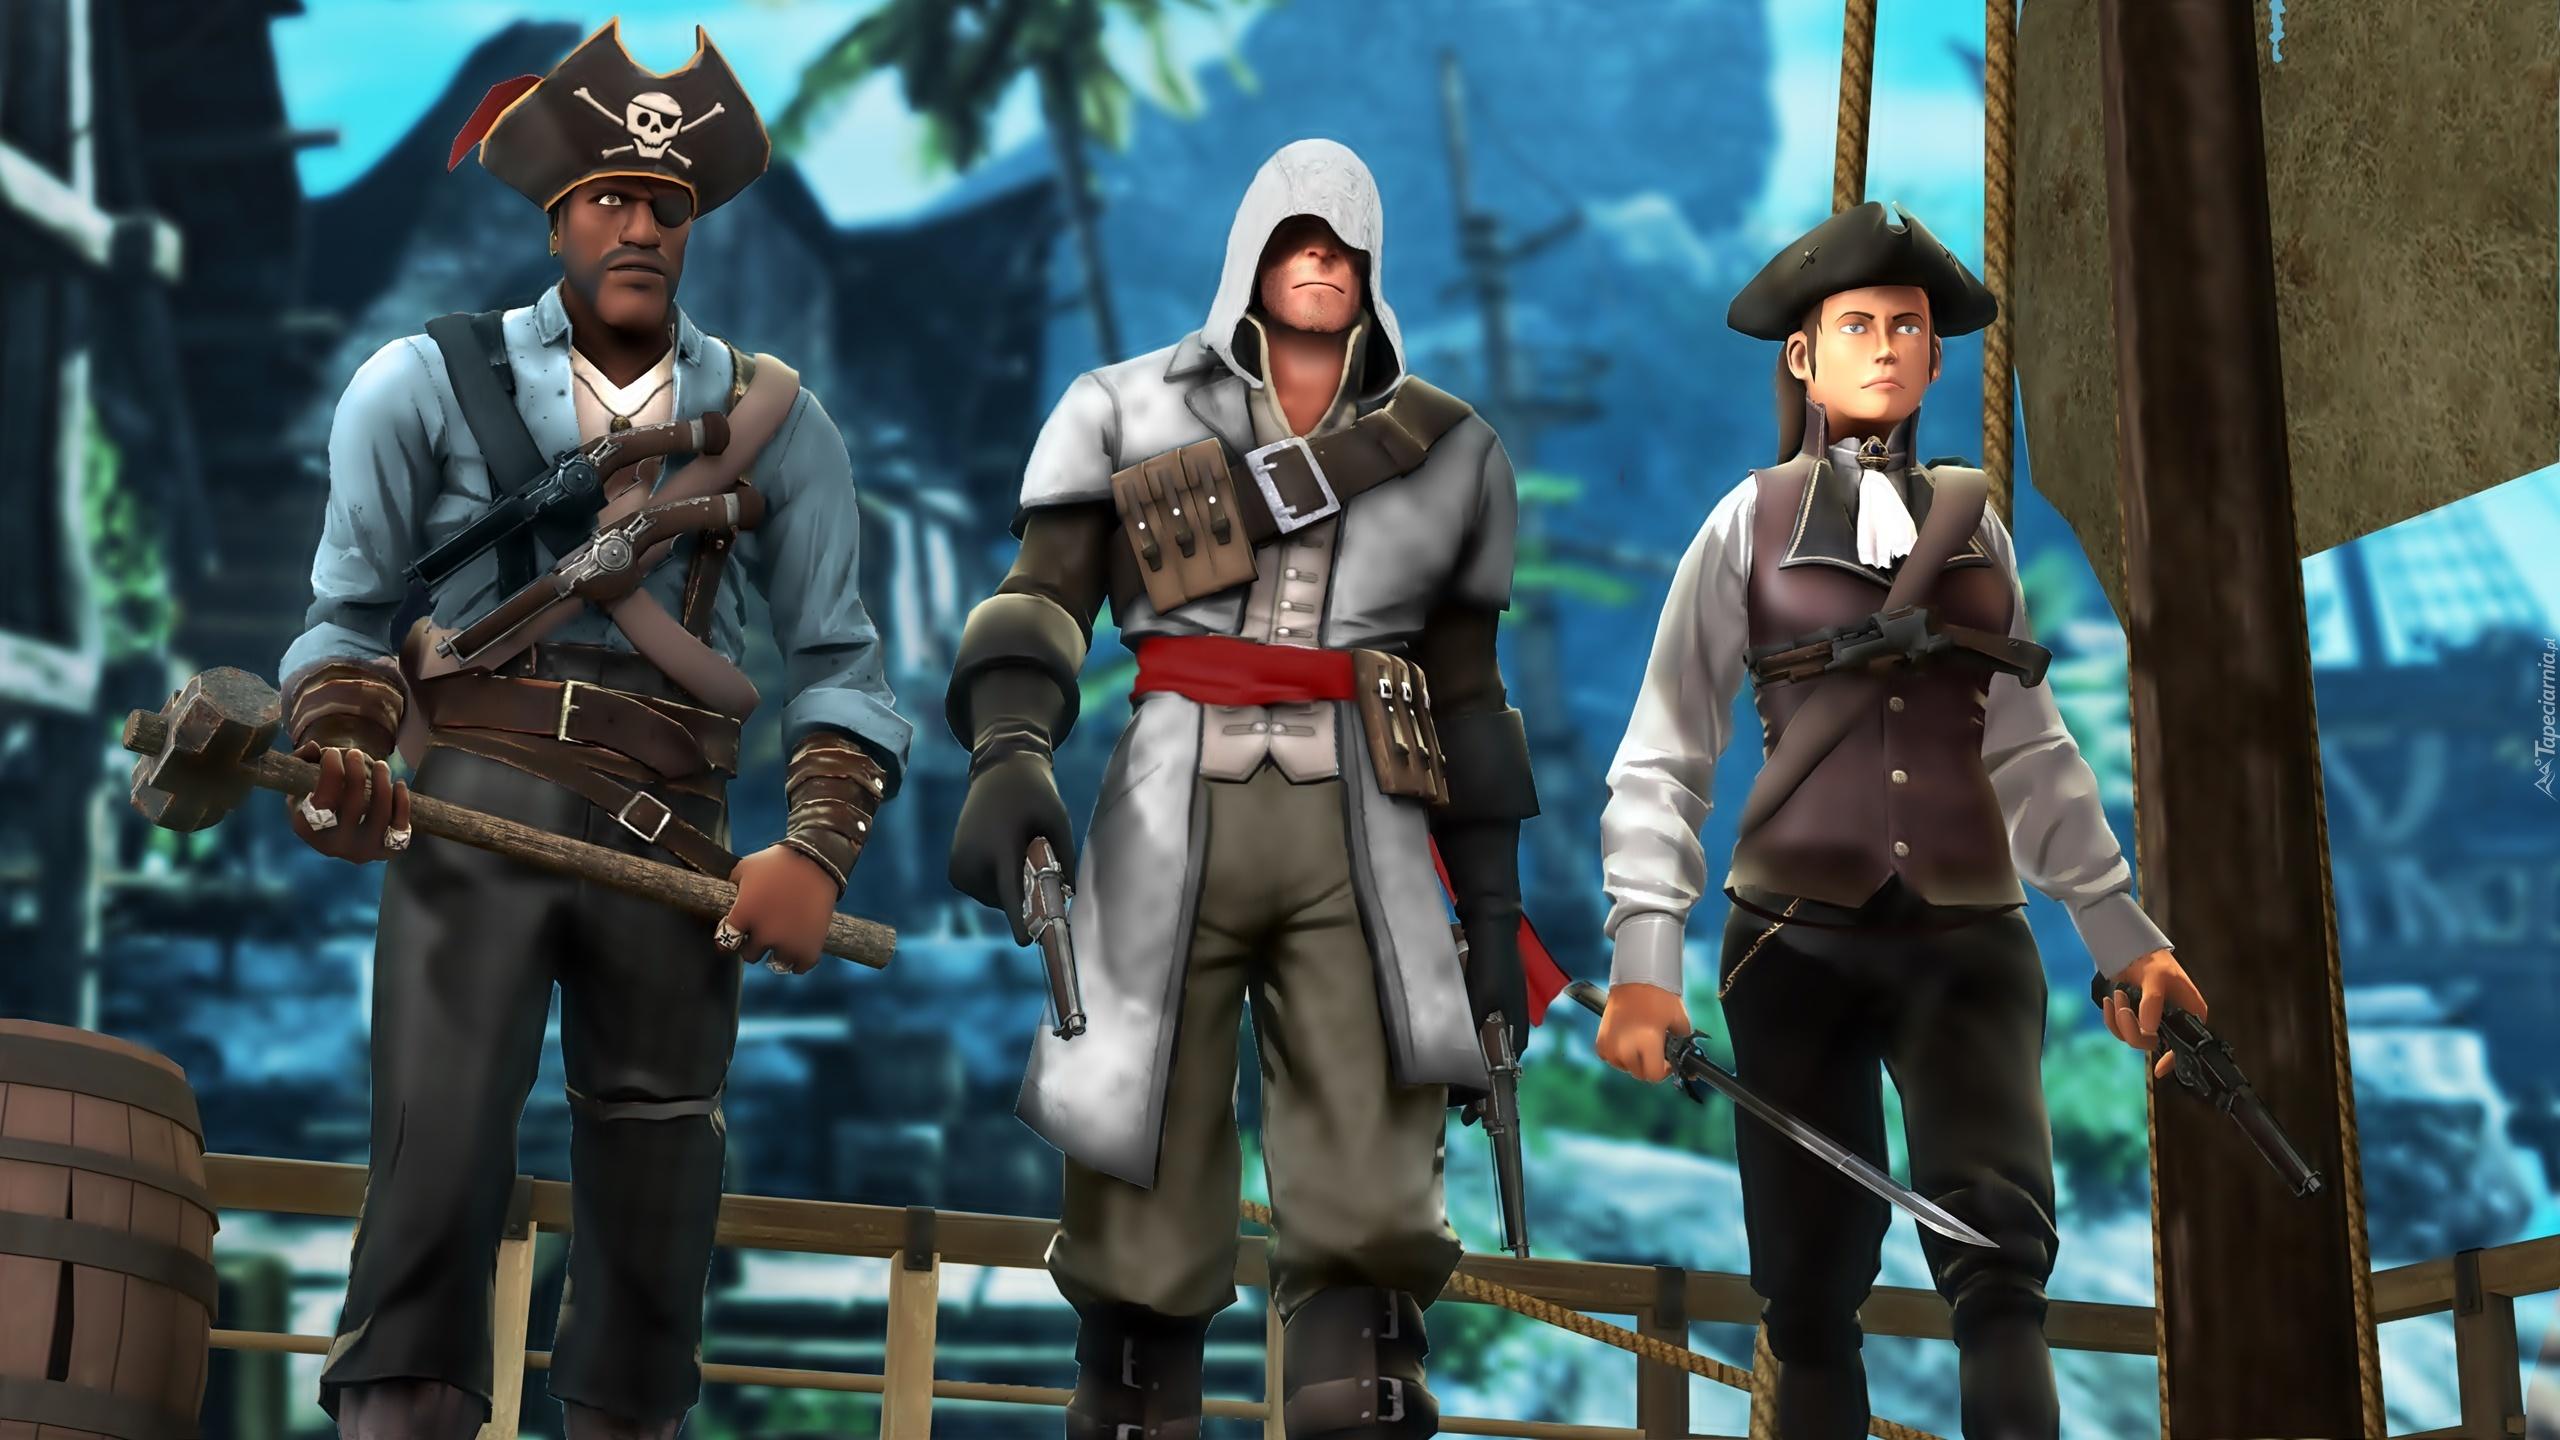 Assassins Creed Assassins Creed 4 Black Flag